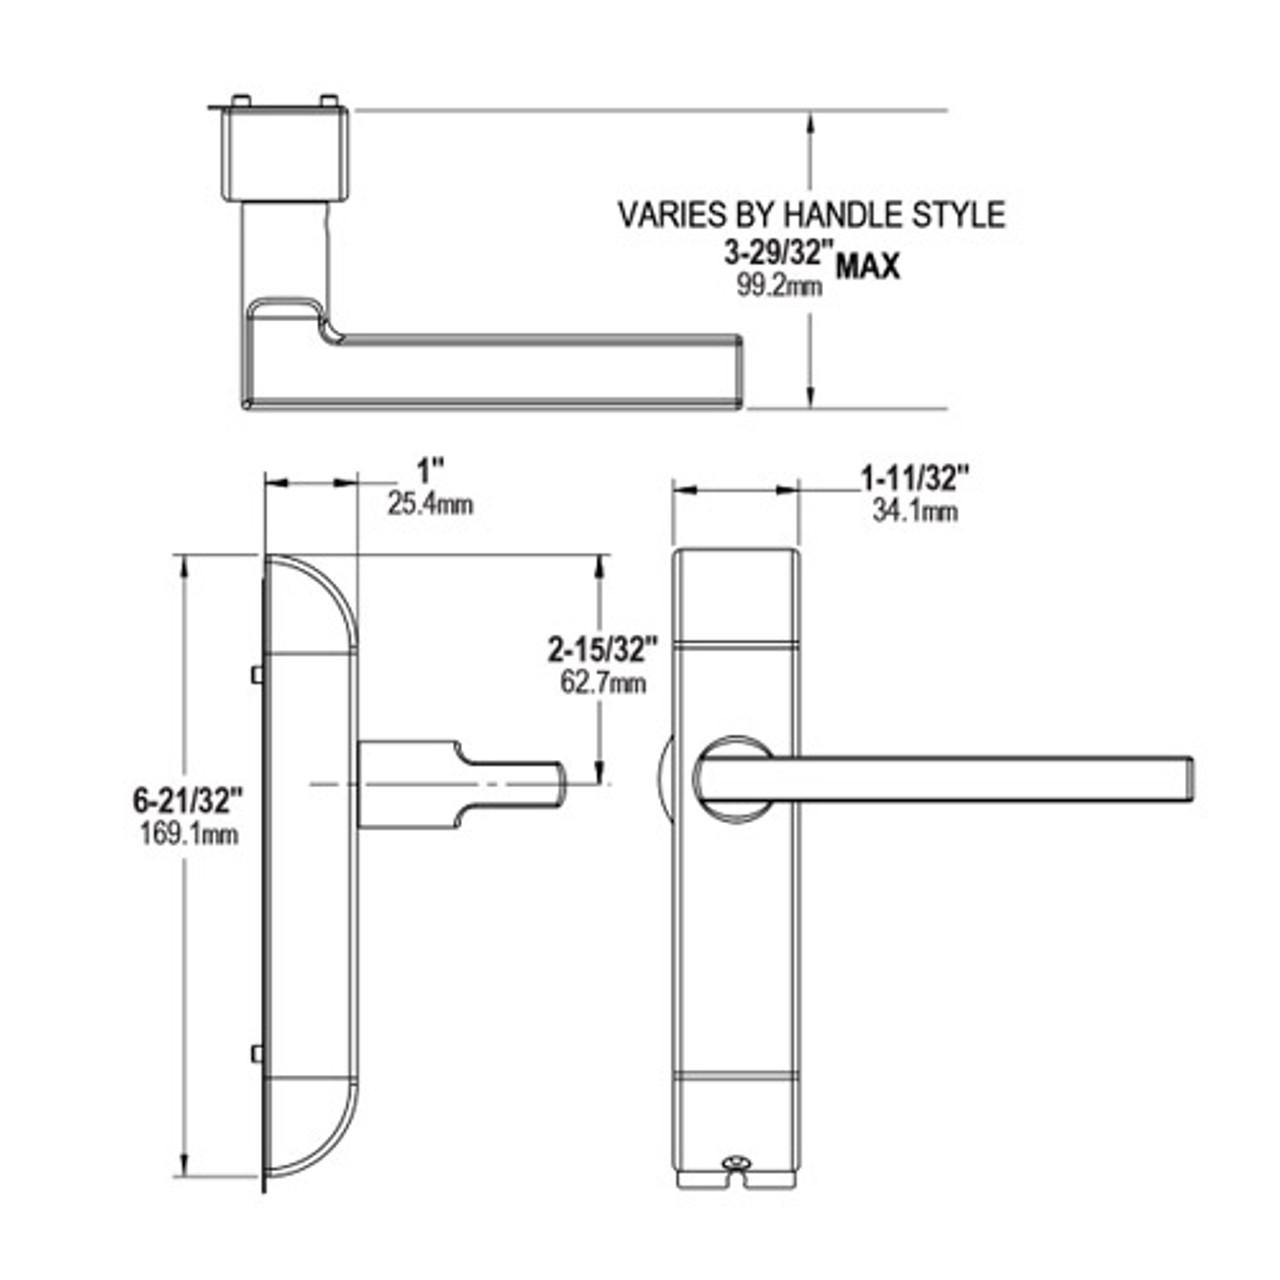 4600M-MV-511-US3 Adams Rite MV Designer handle Dimensional View